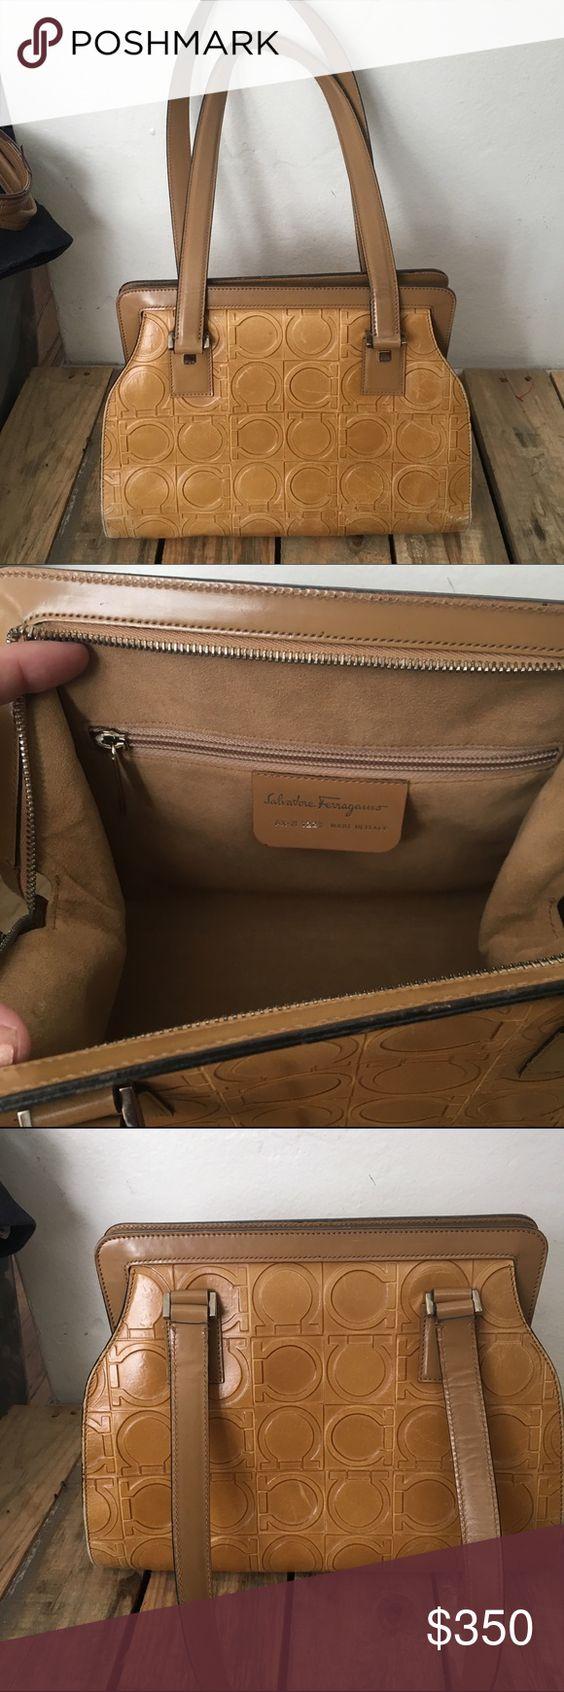 Ferragamo Tan Leather Monogram Logo Handbag EUC Authentic Beautiful Ferragamo Bag Inside is perfectly clean & rest of bag shows only the slightest bit of wear Ferragamo Bags Shoulder Bags